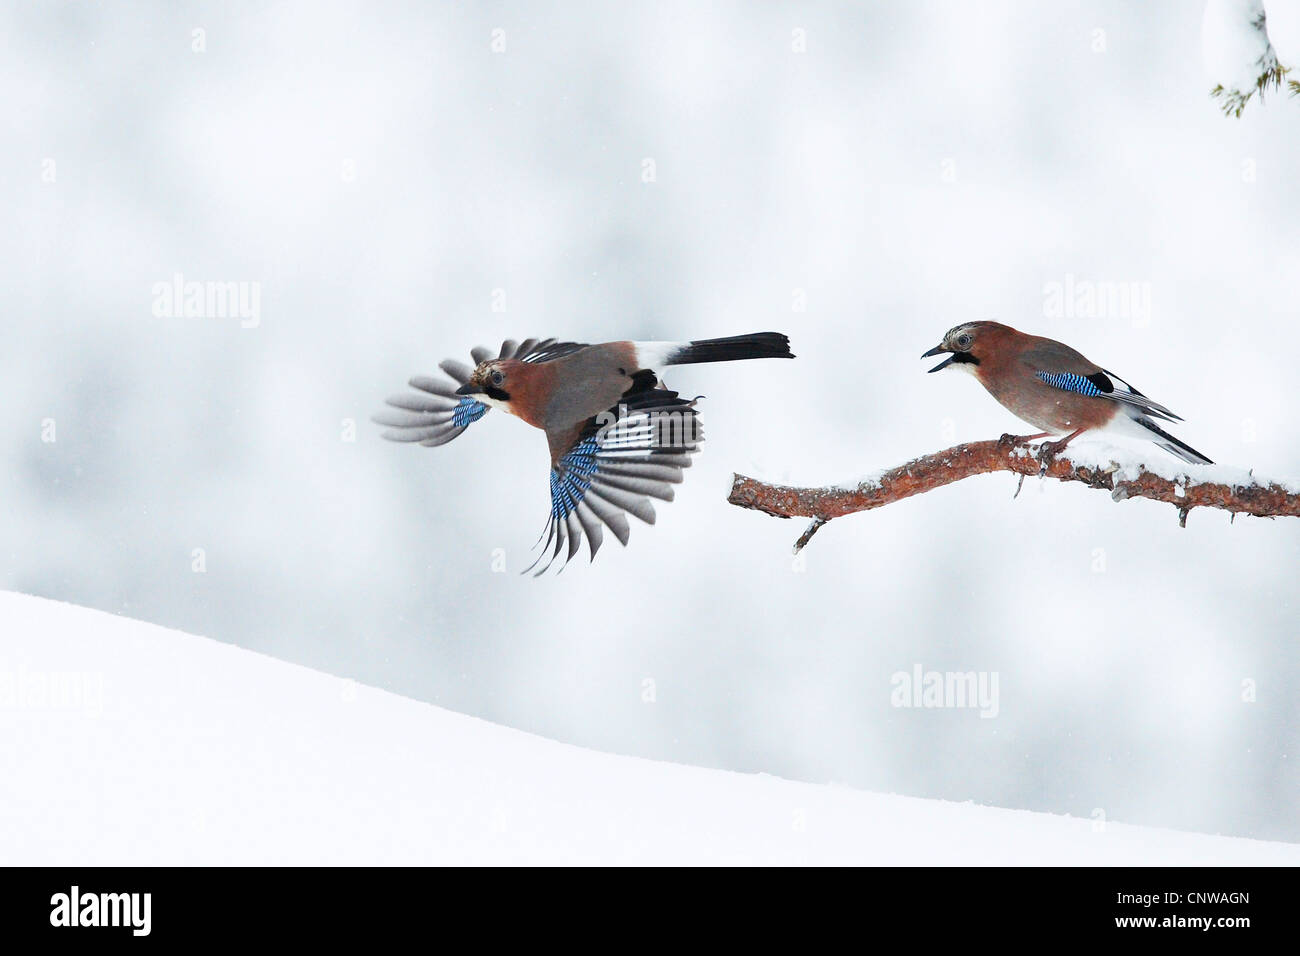 jay (Garrulus glandarius), two birds in winter, Norway, Namdal, Troendelag, Flatanger, Lauvsnes - Stock Image